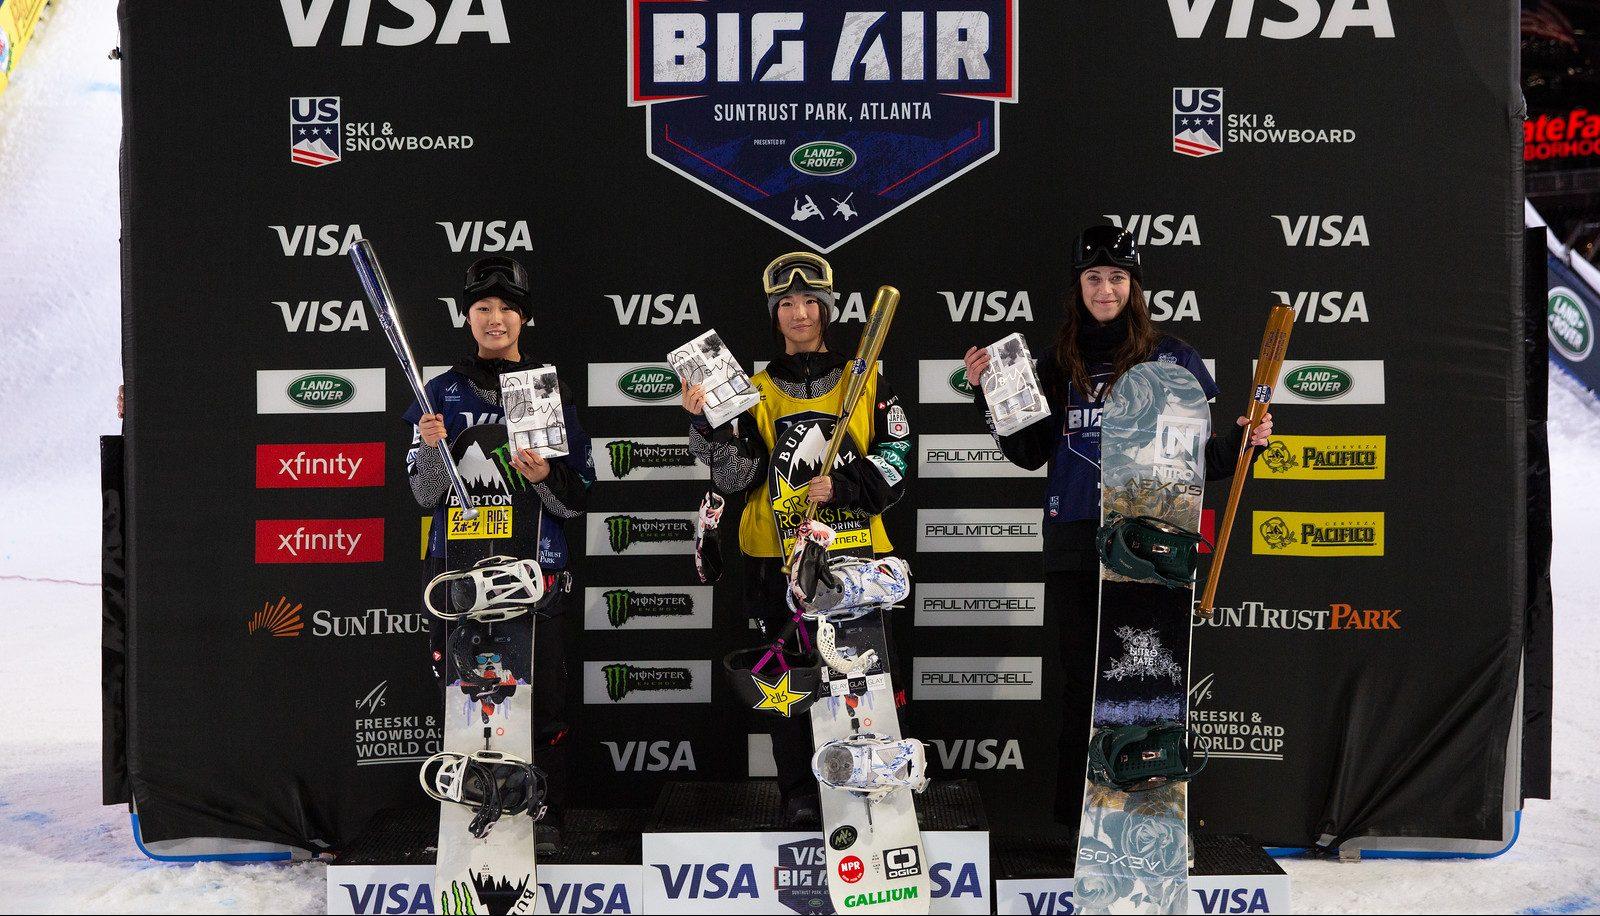 Snowboard Finals 2019 Visa Big Air presented by Land Rover at SunTrust Park, Atlanta. Brooke Voigt won bronze in the women's competition on December 20th, 2019. Photo: U.S. Ski & Snowboard.